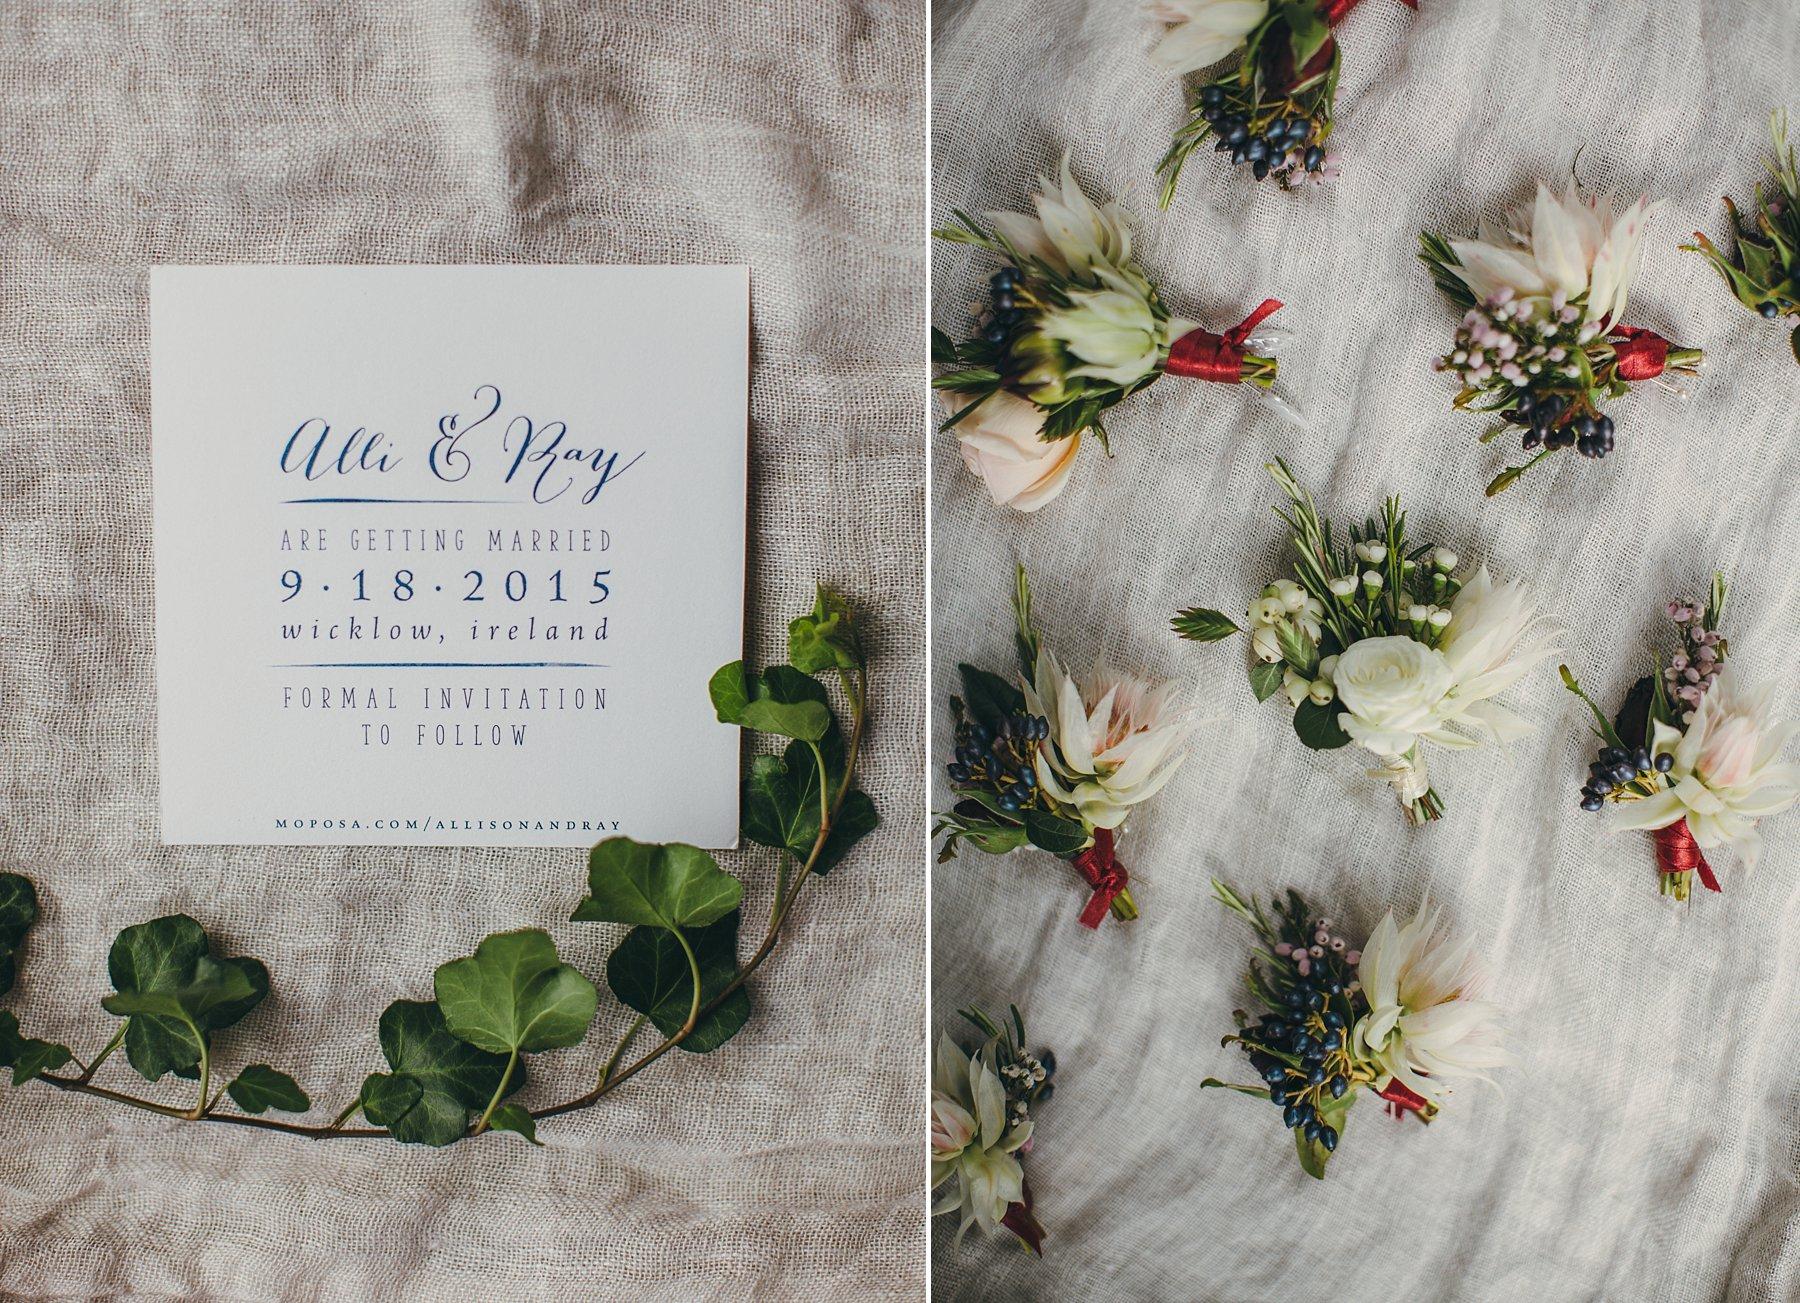 brooklodge_ireland_wicklow_weddings_0004